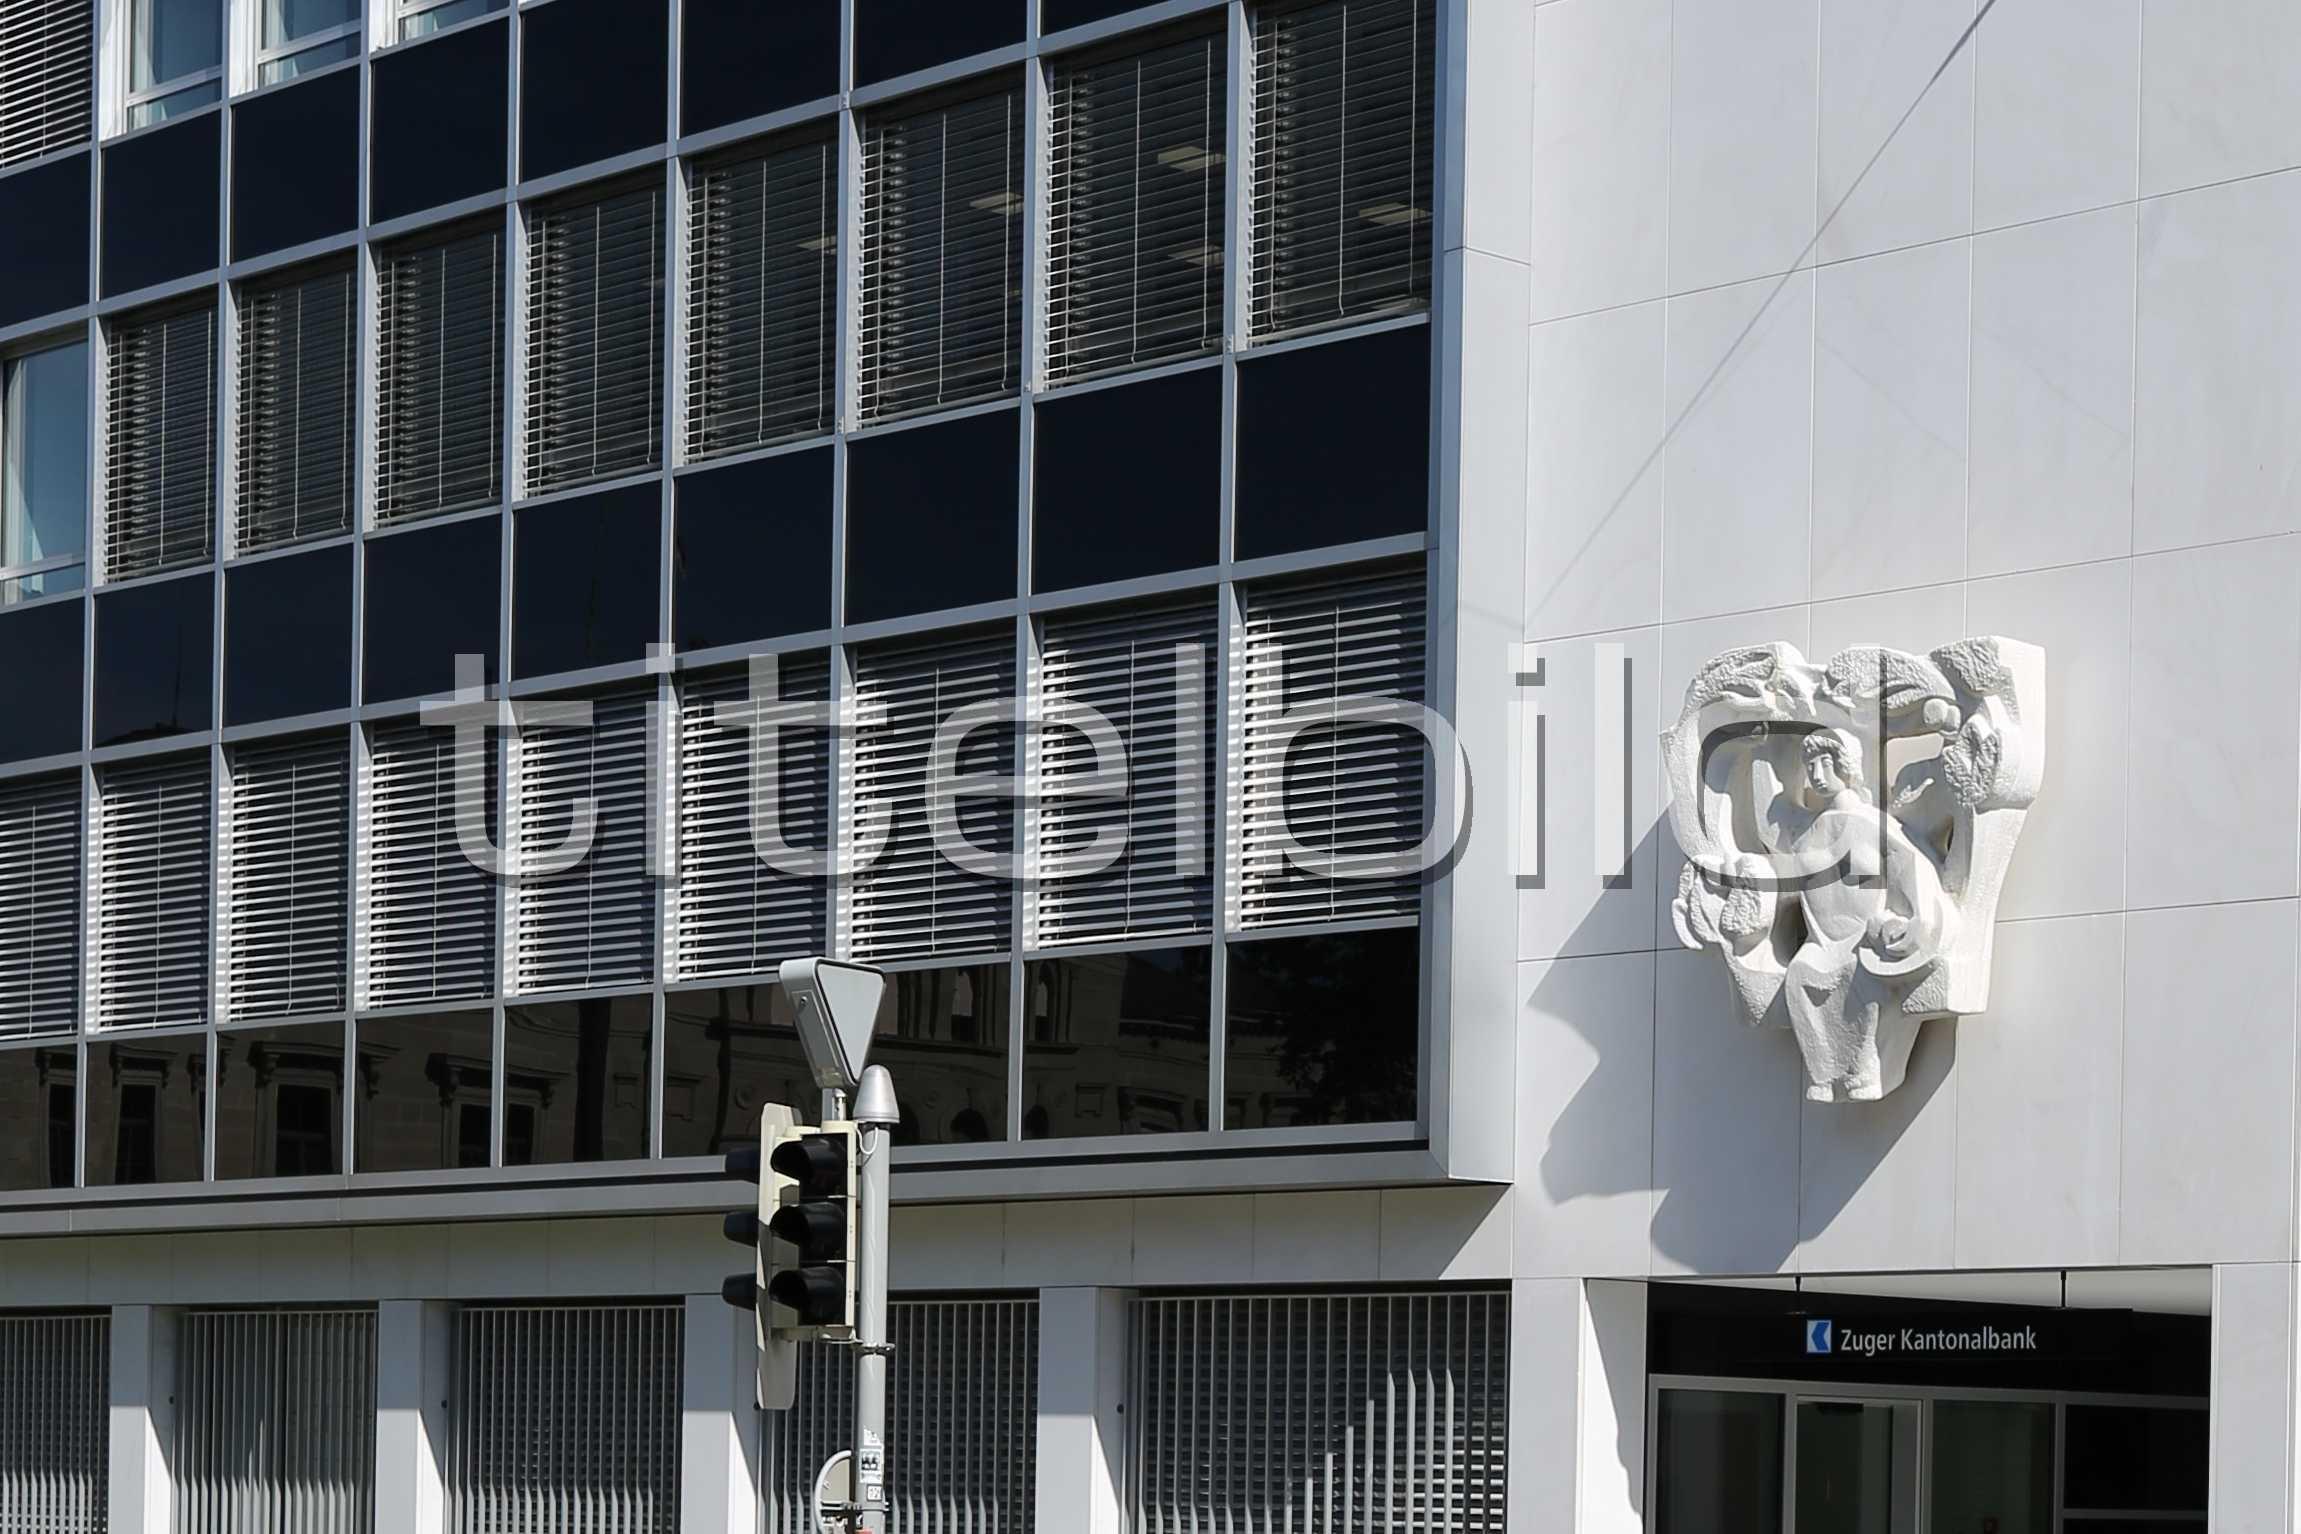 Projektbild-Nr. 3: Zuger Kantonalbank